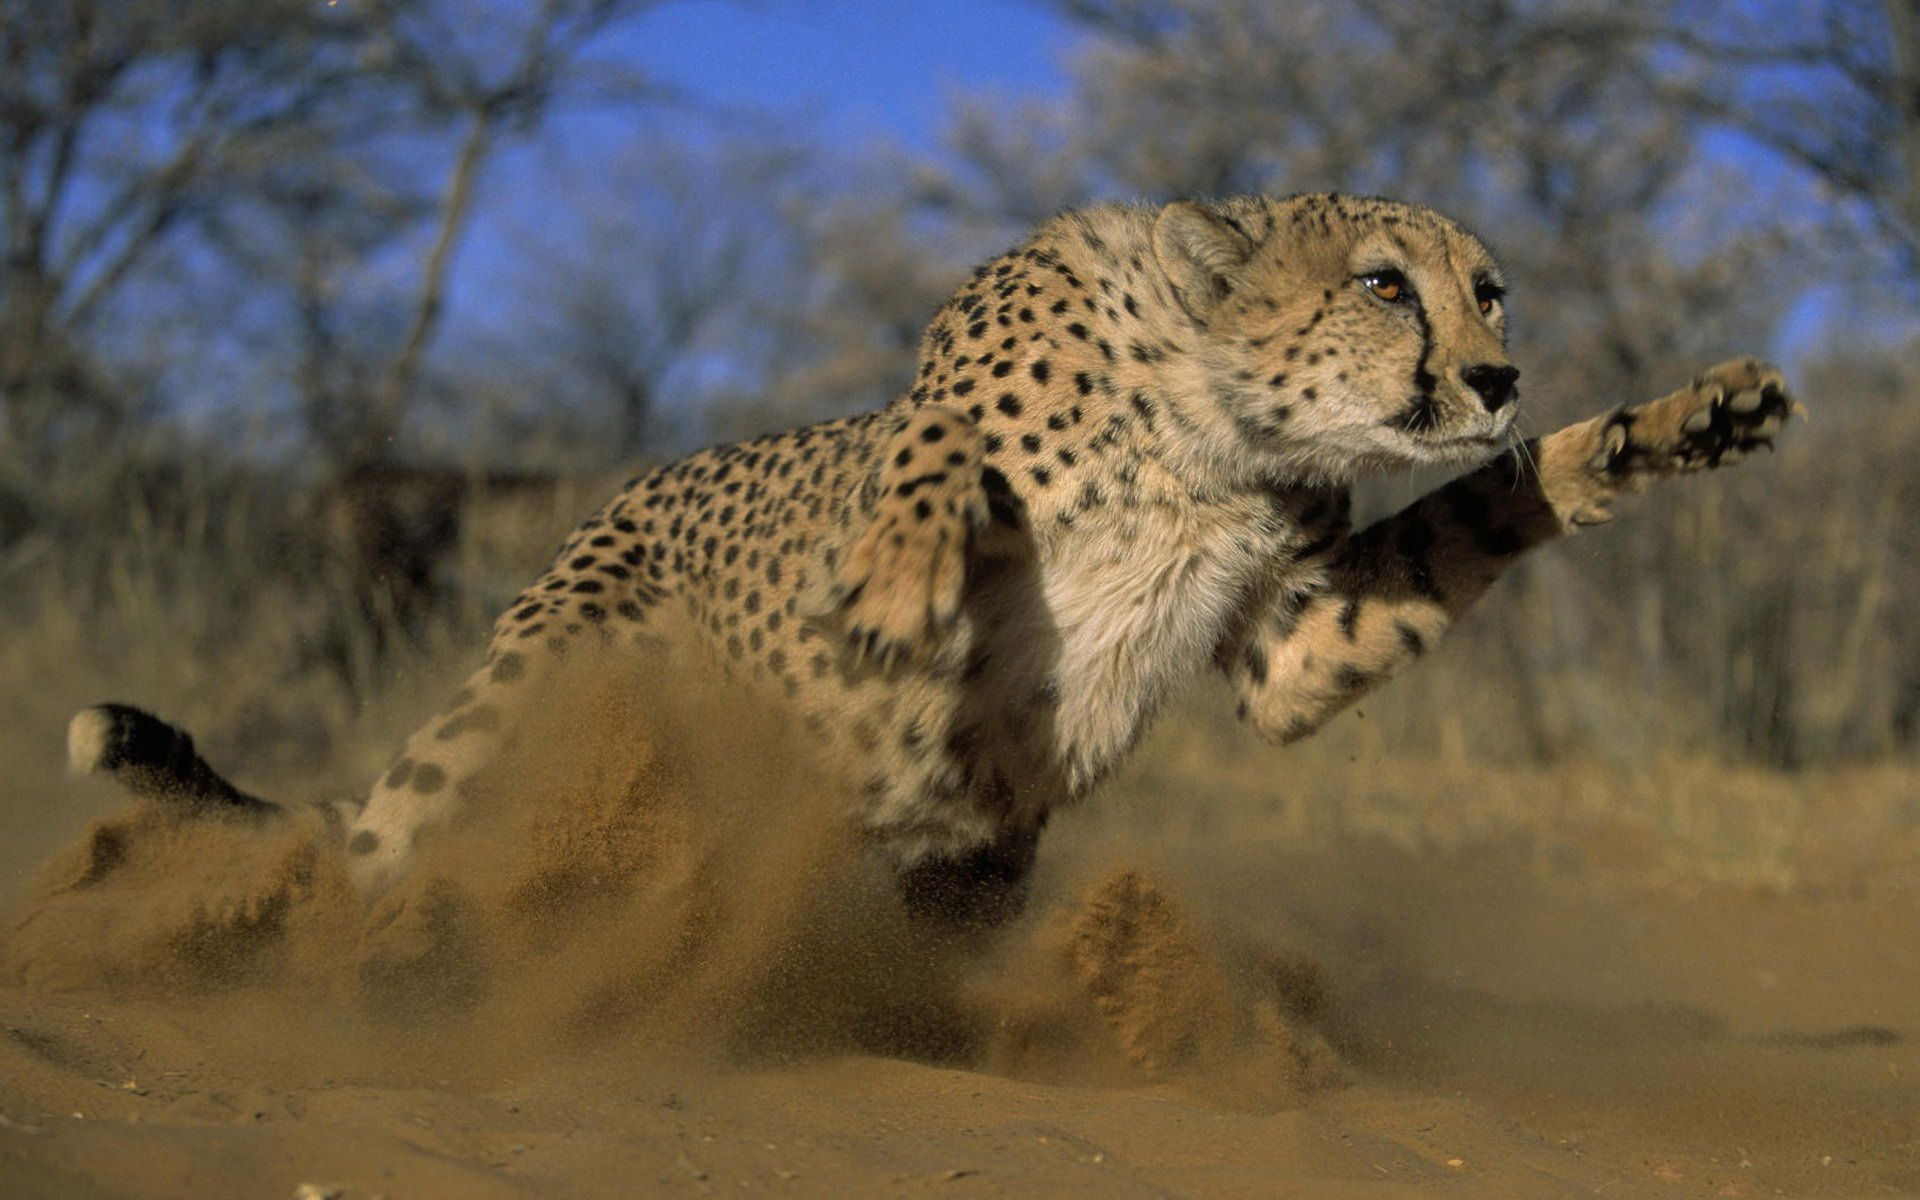 Cheetah HD Wallpapers Backgrounds Wallpaper